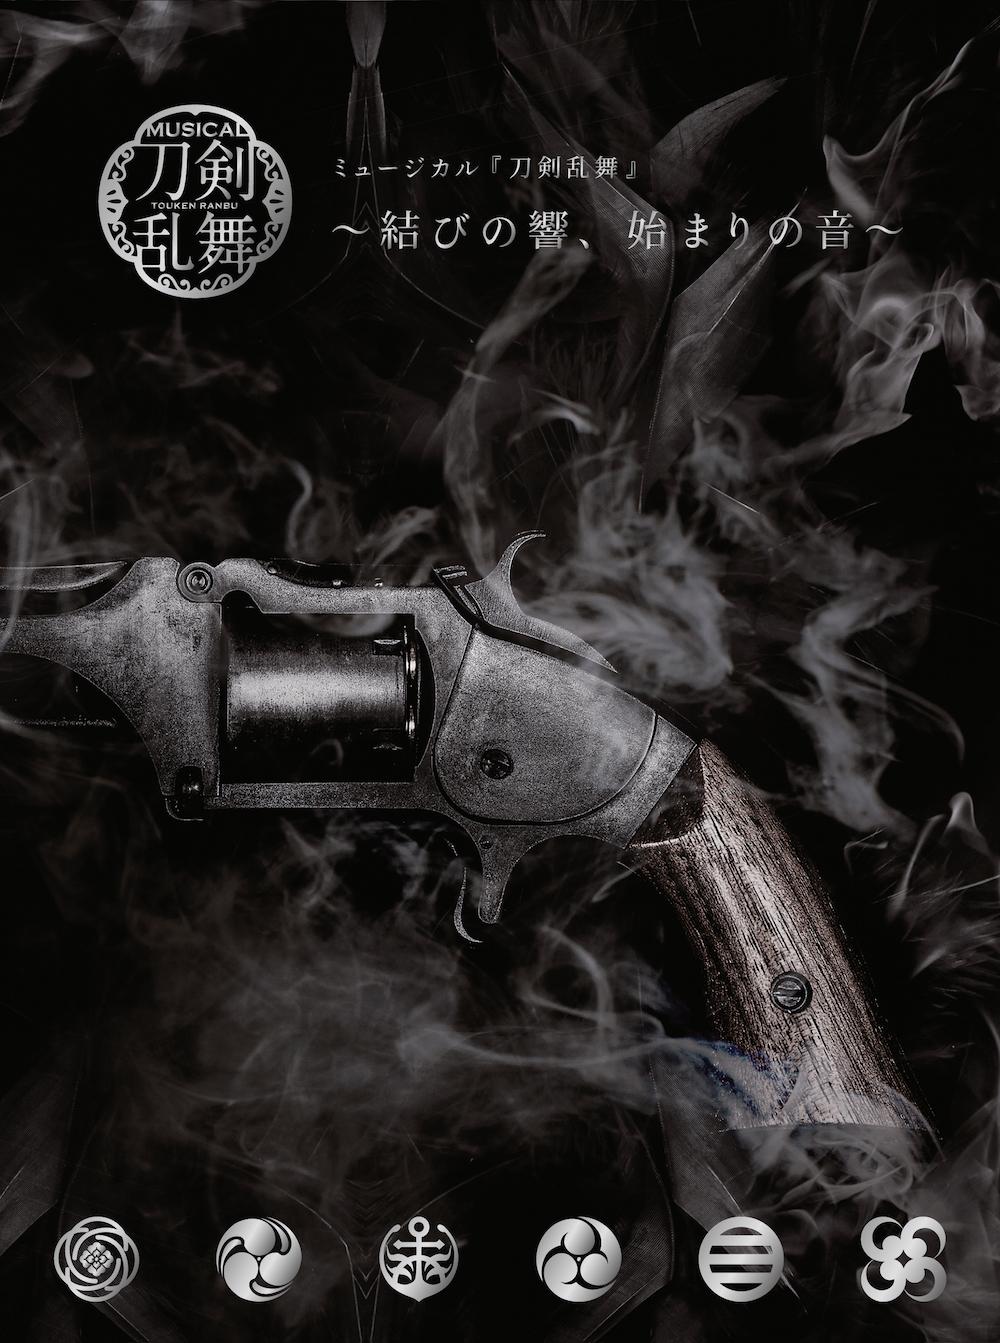 5thアルバム ミュージカル 刀剣乱舞 結びの響 始まりの音 初回